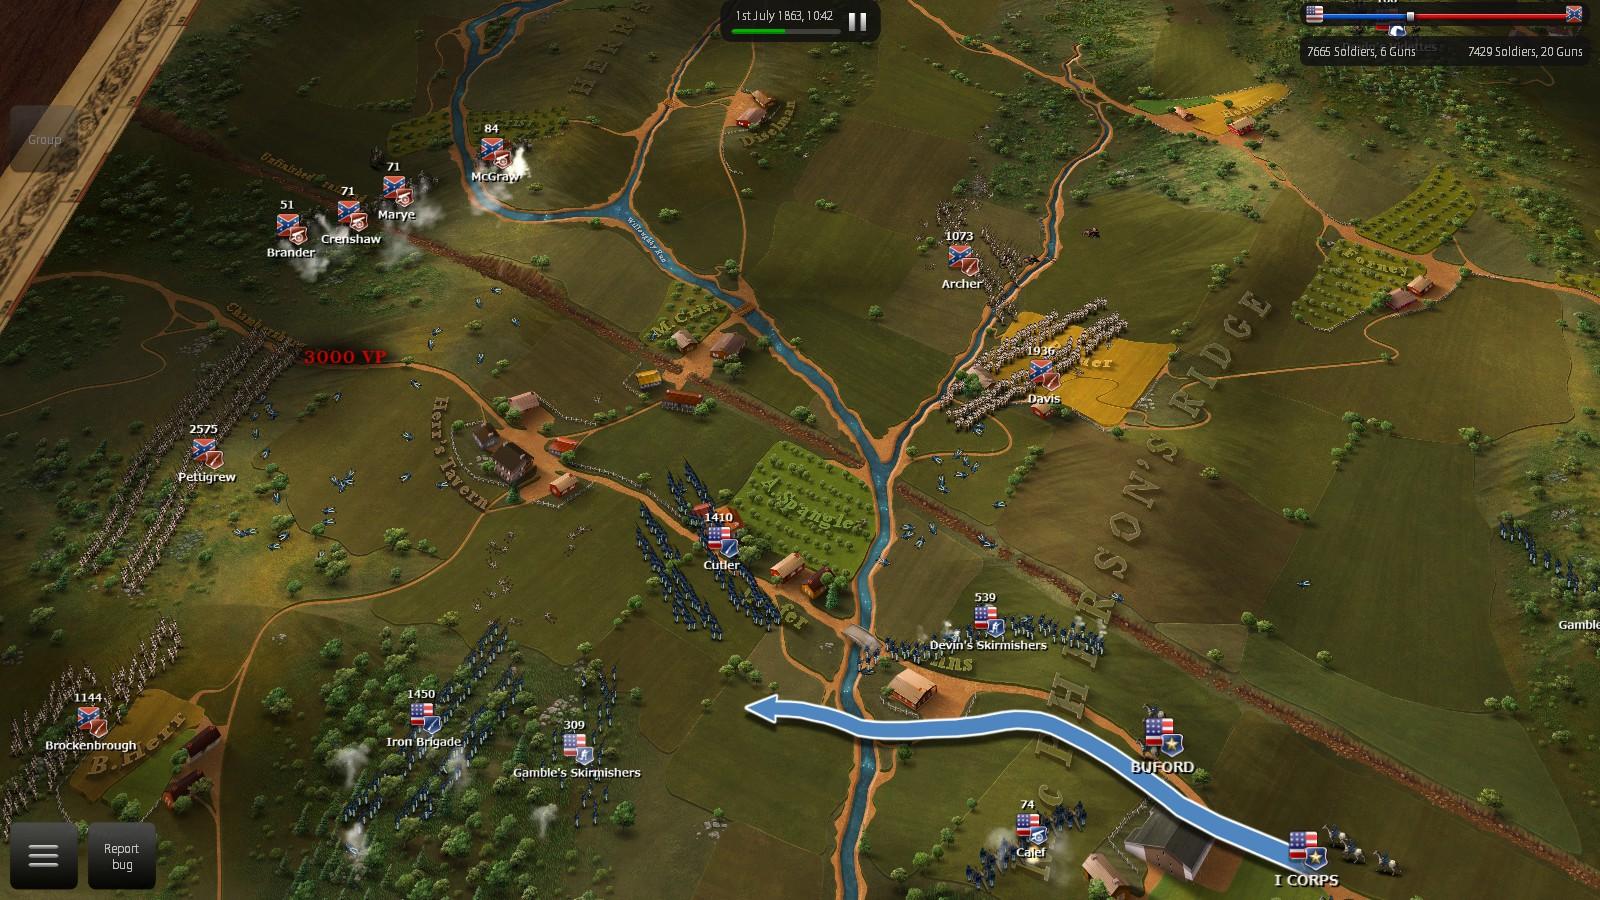 Ultimate Battle: Gettysburg screenshot by Zach Yost.